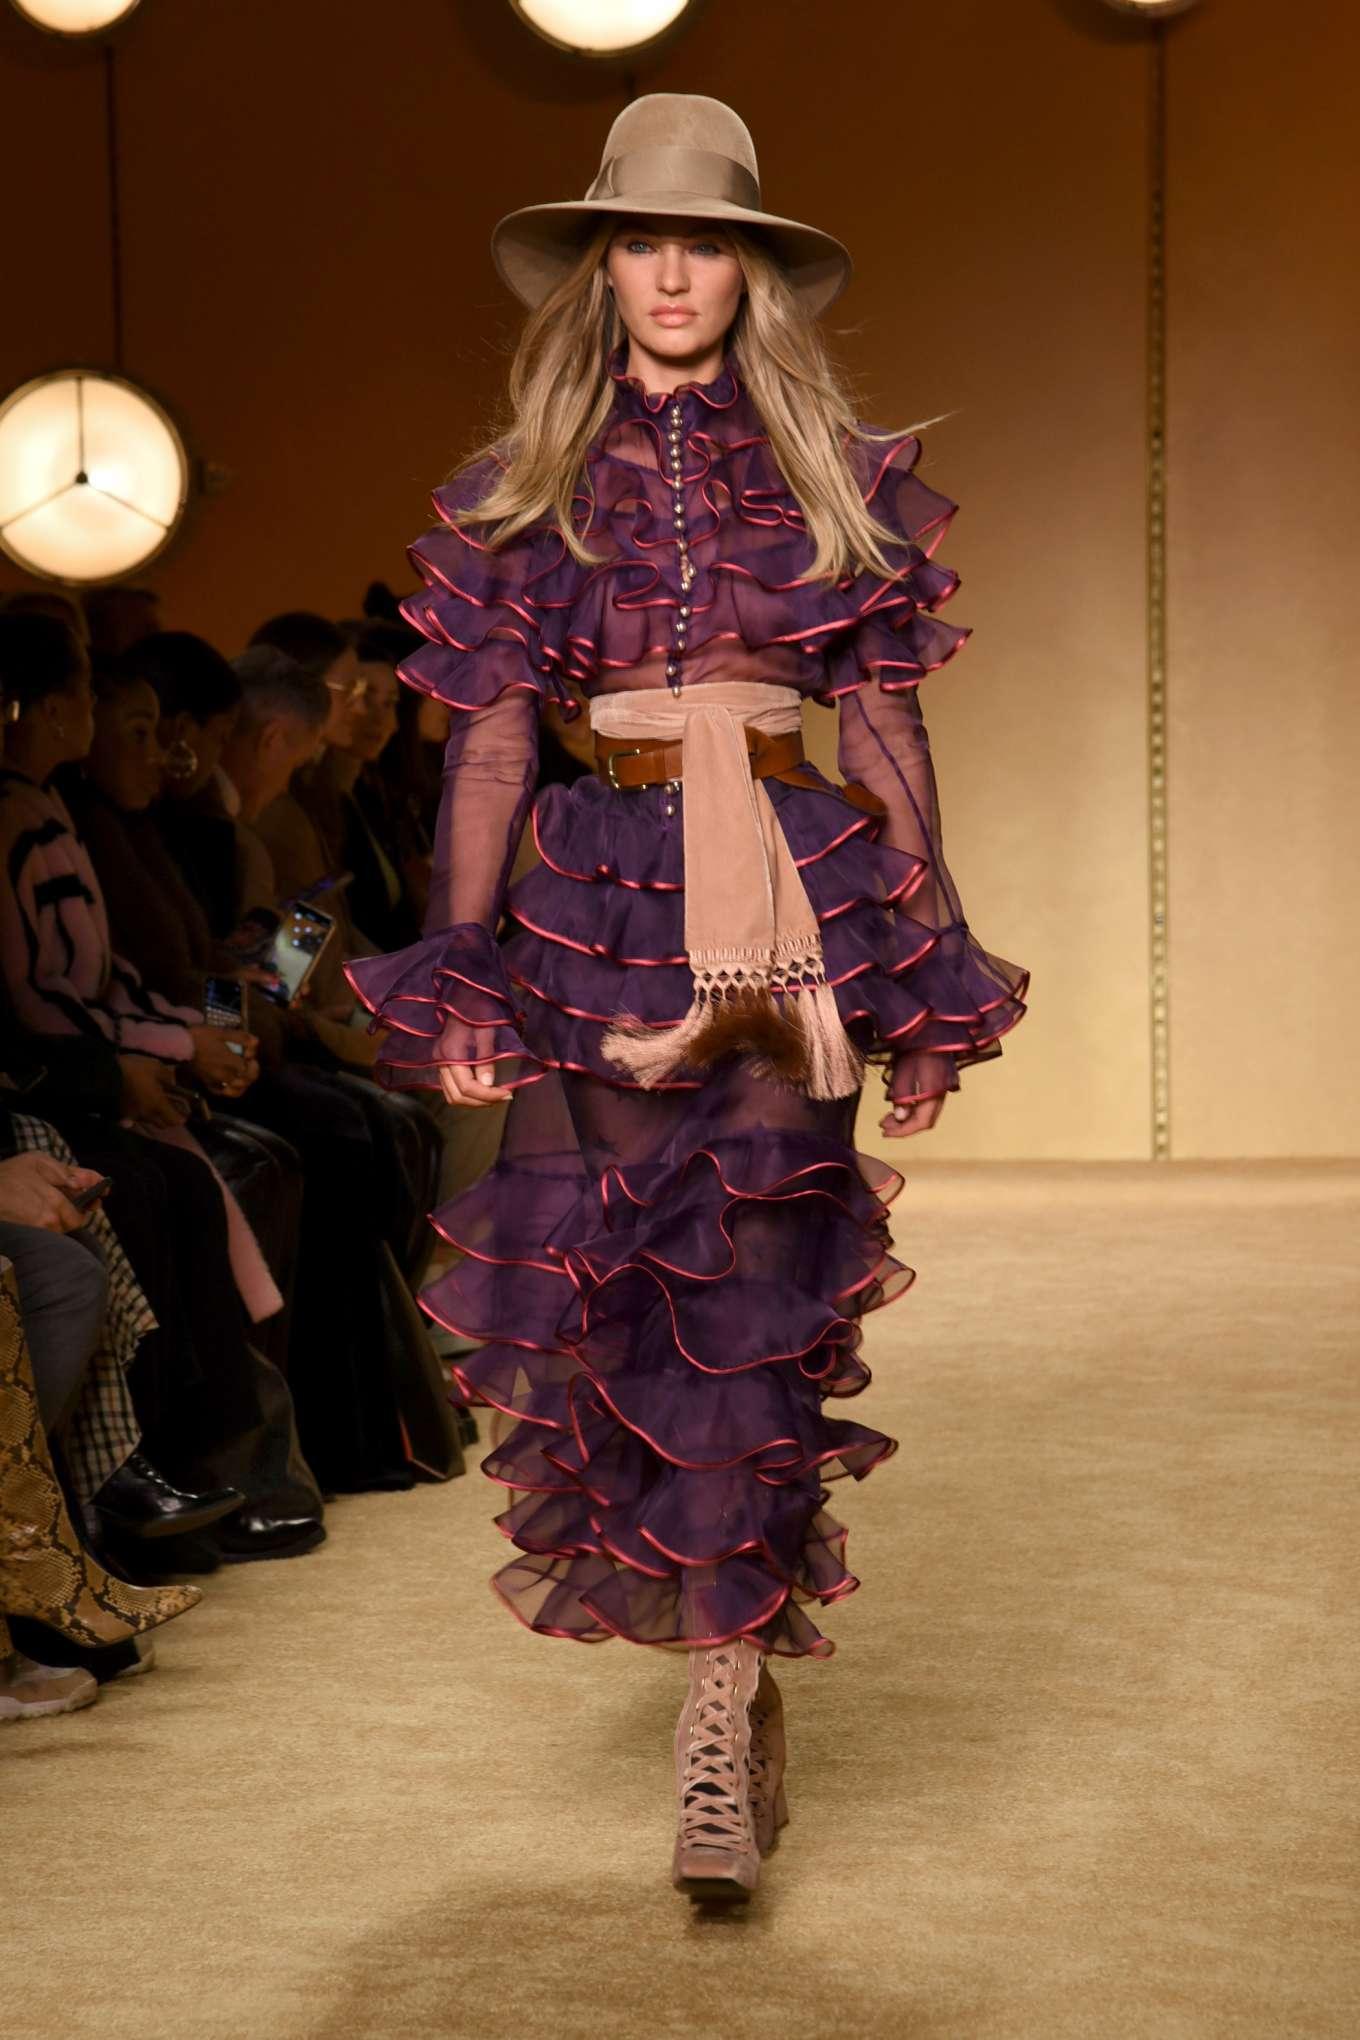 Candice Swanepoel - Zimmermann Runway Show 2020 at New York Fashion Week